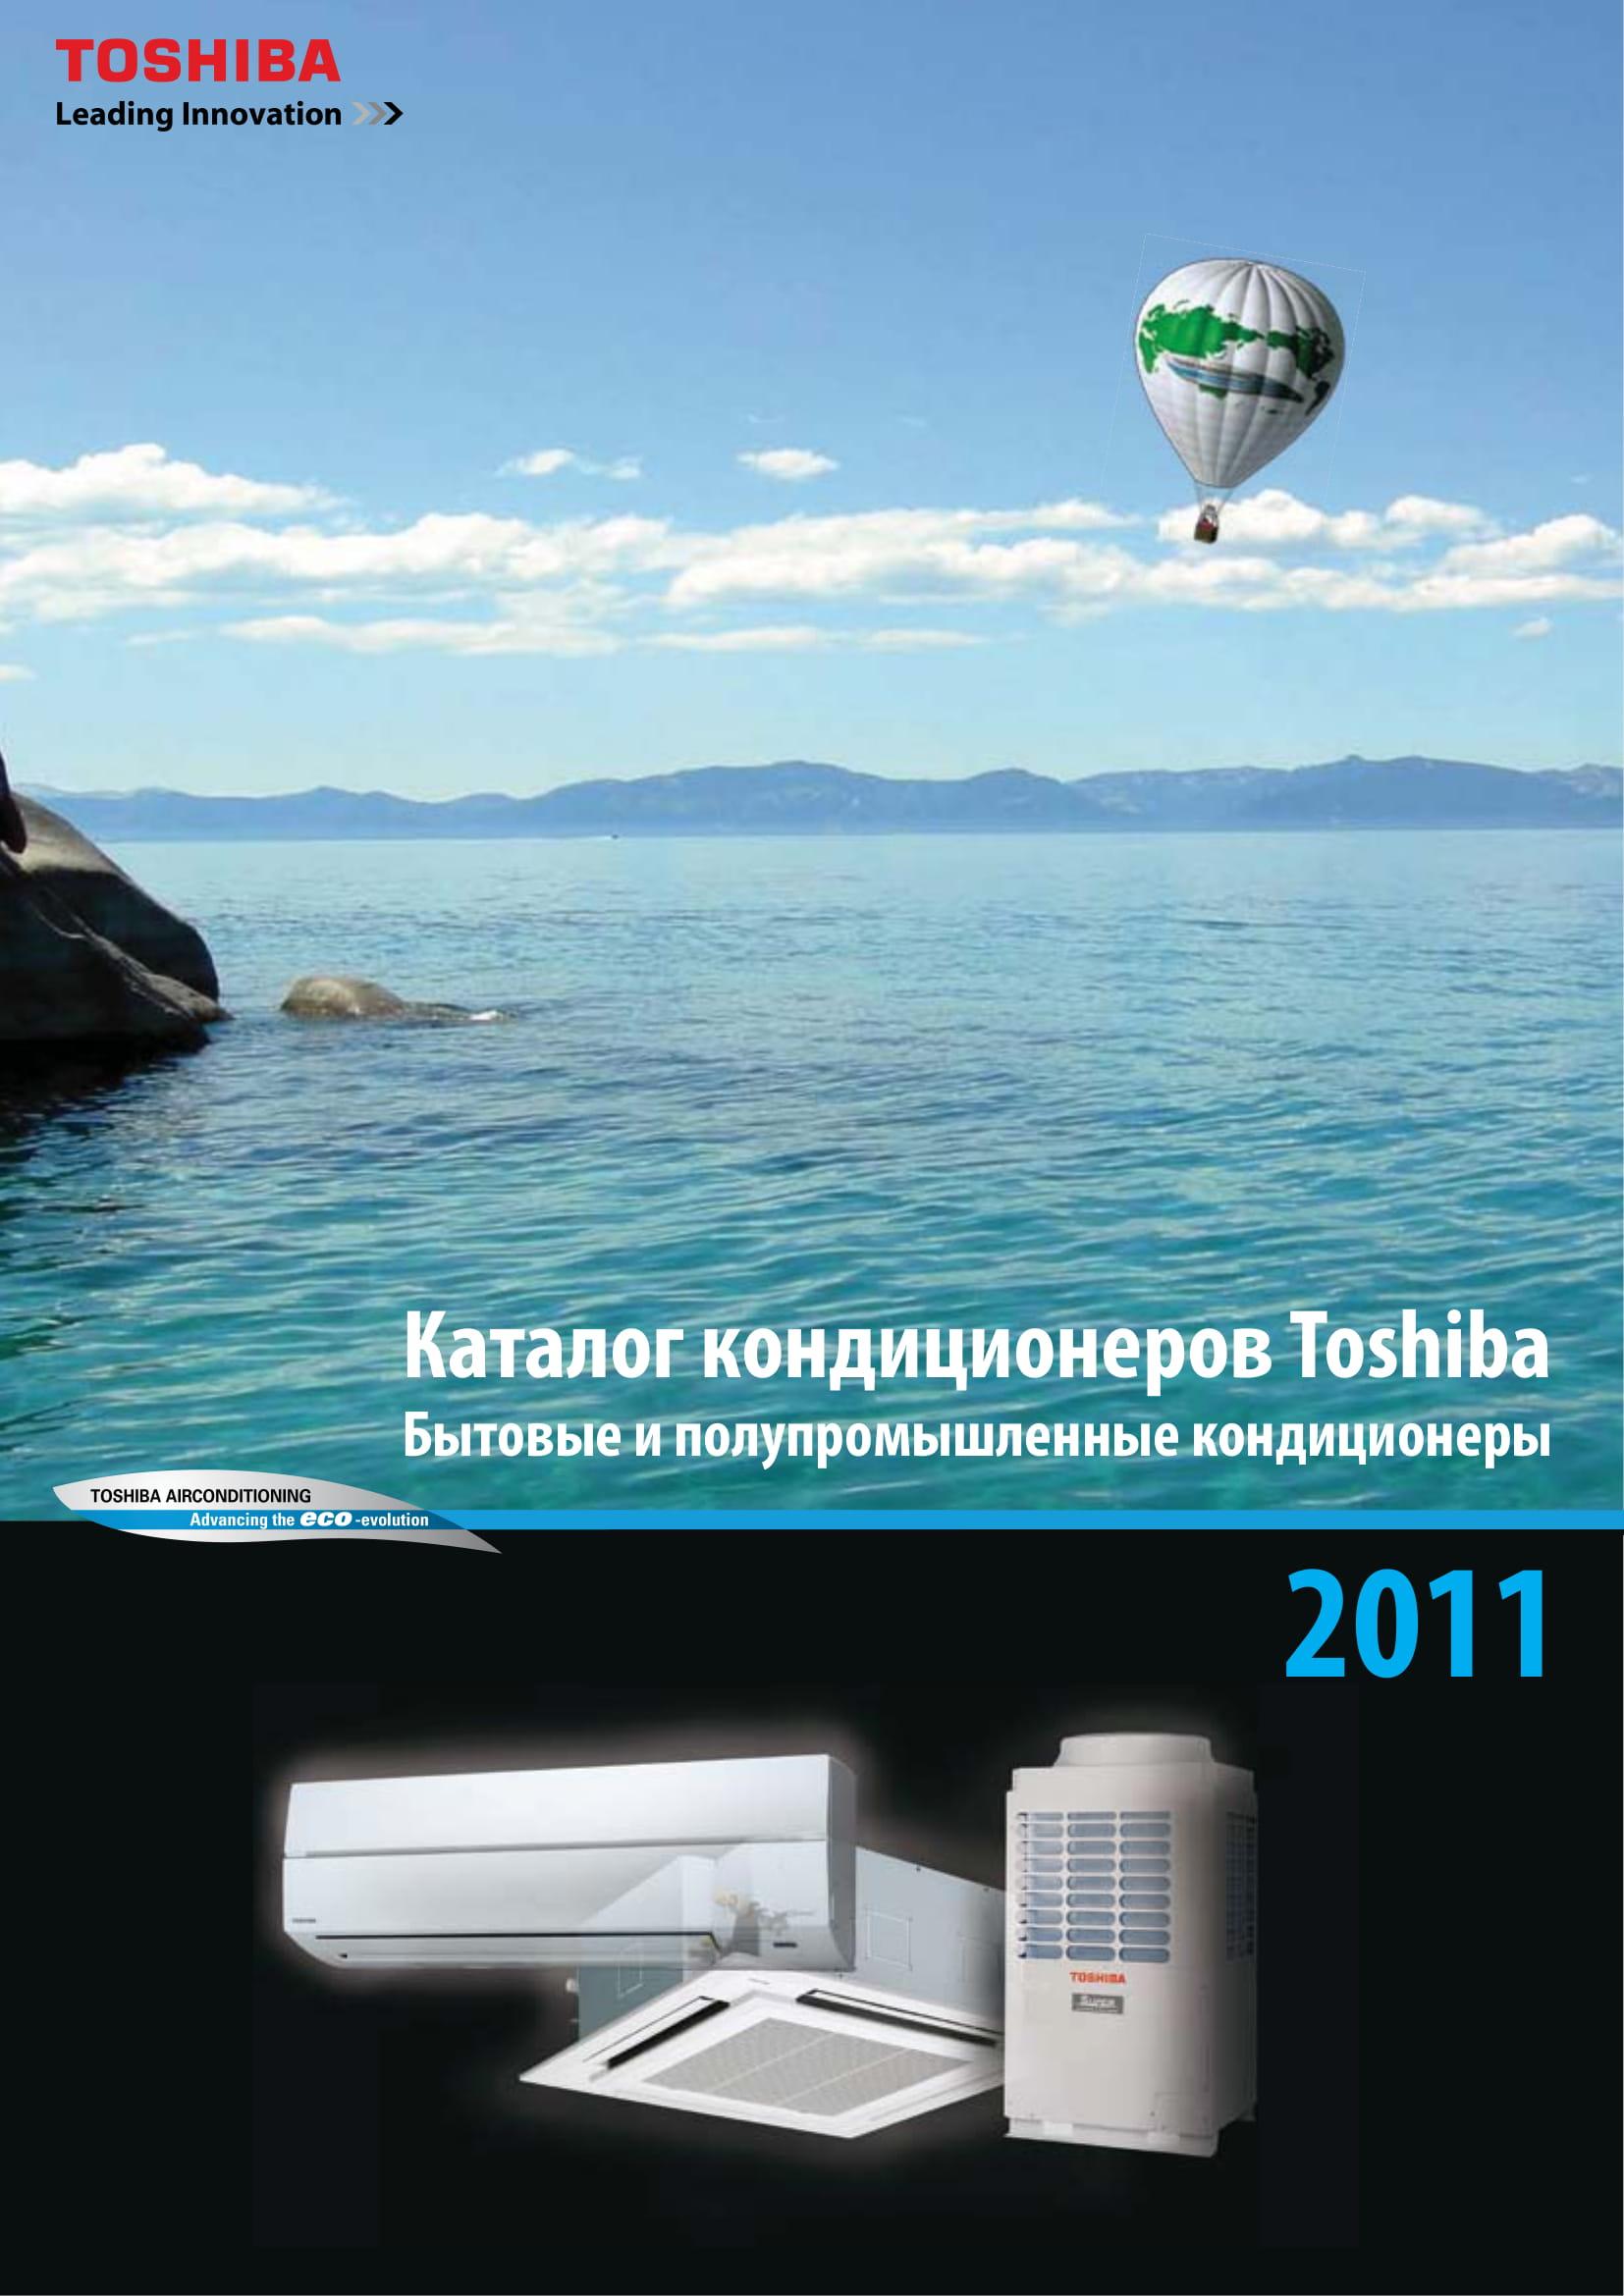 каталог Toshiba 2011